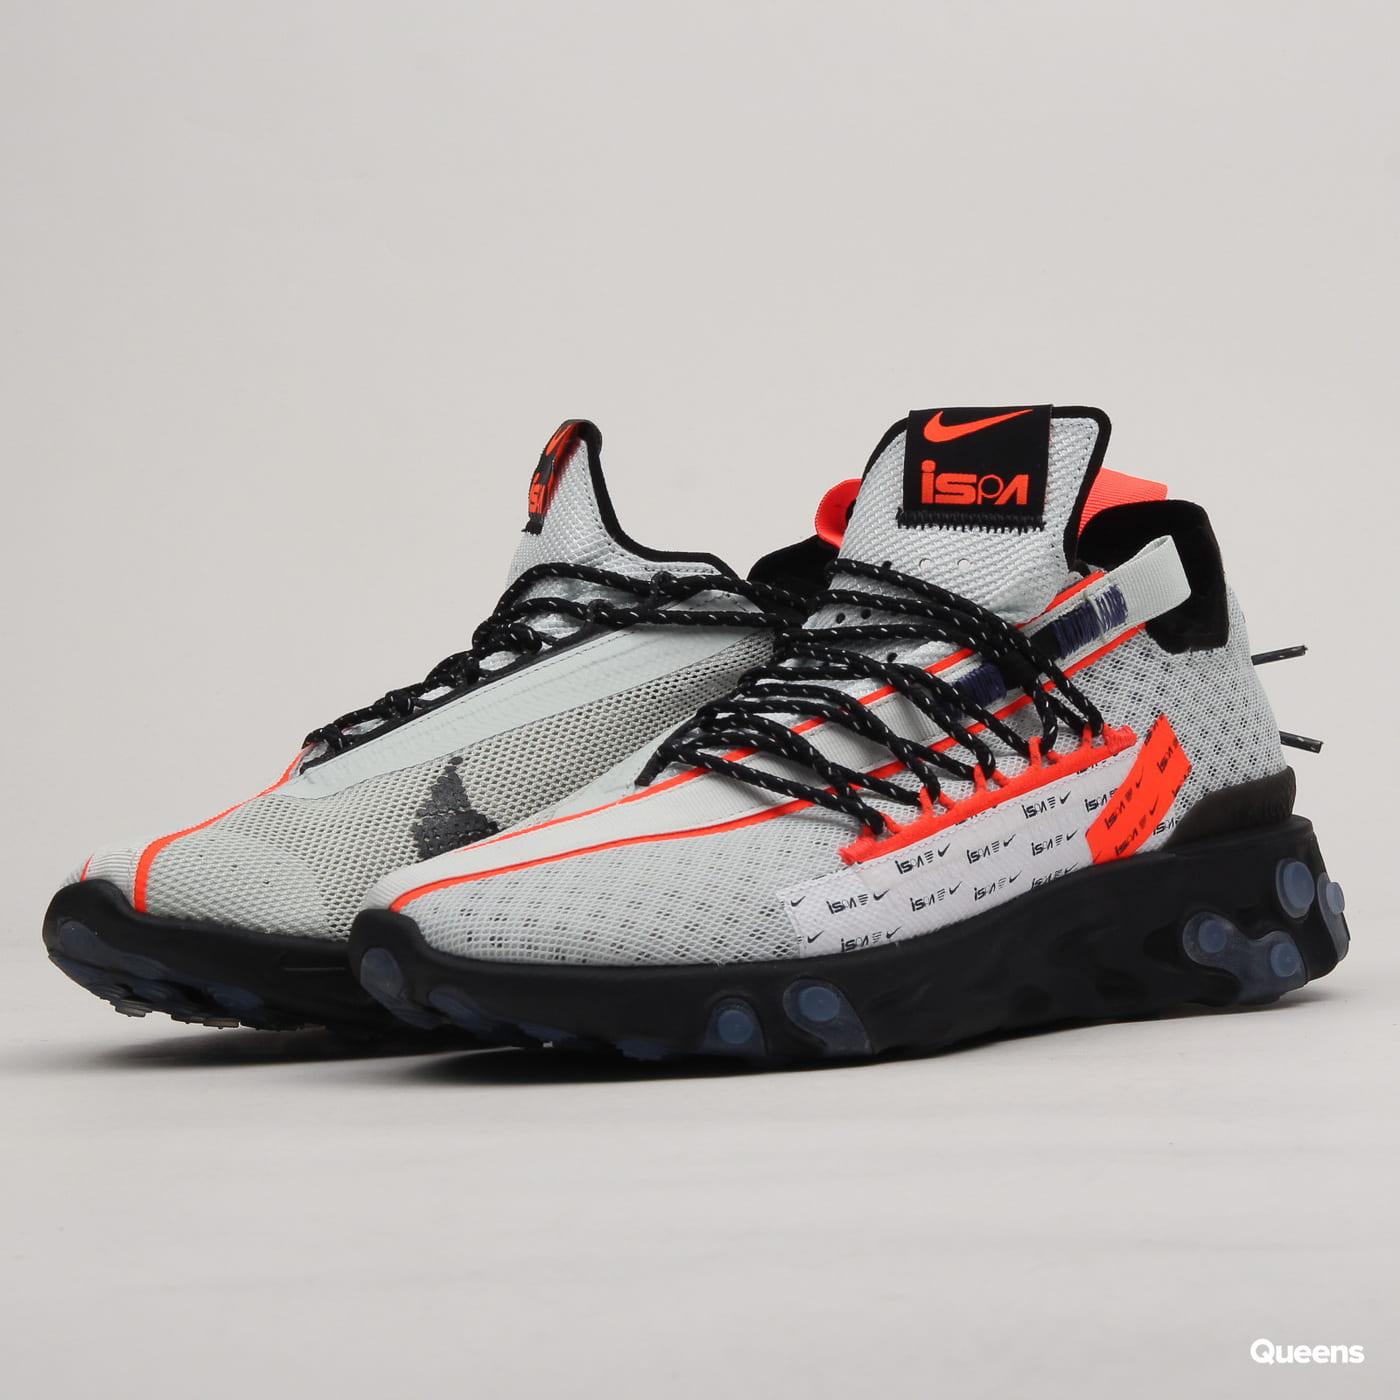 online retailer timeless design reasonable price Nike React ISPA ghost aqua / total crimson - black